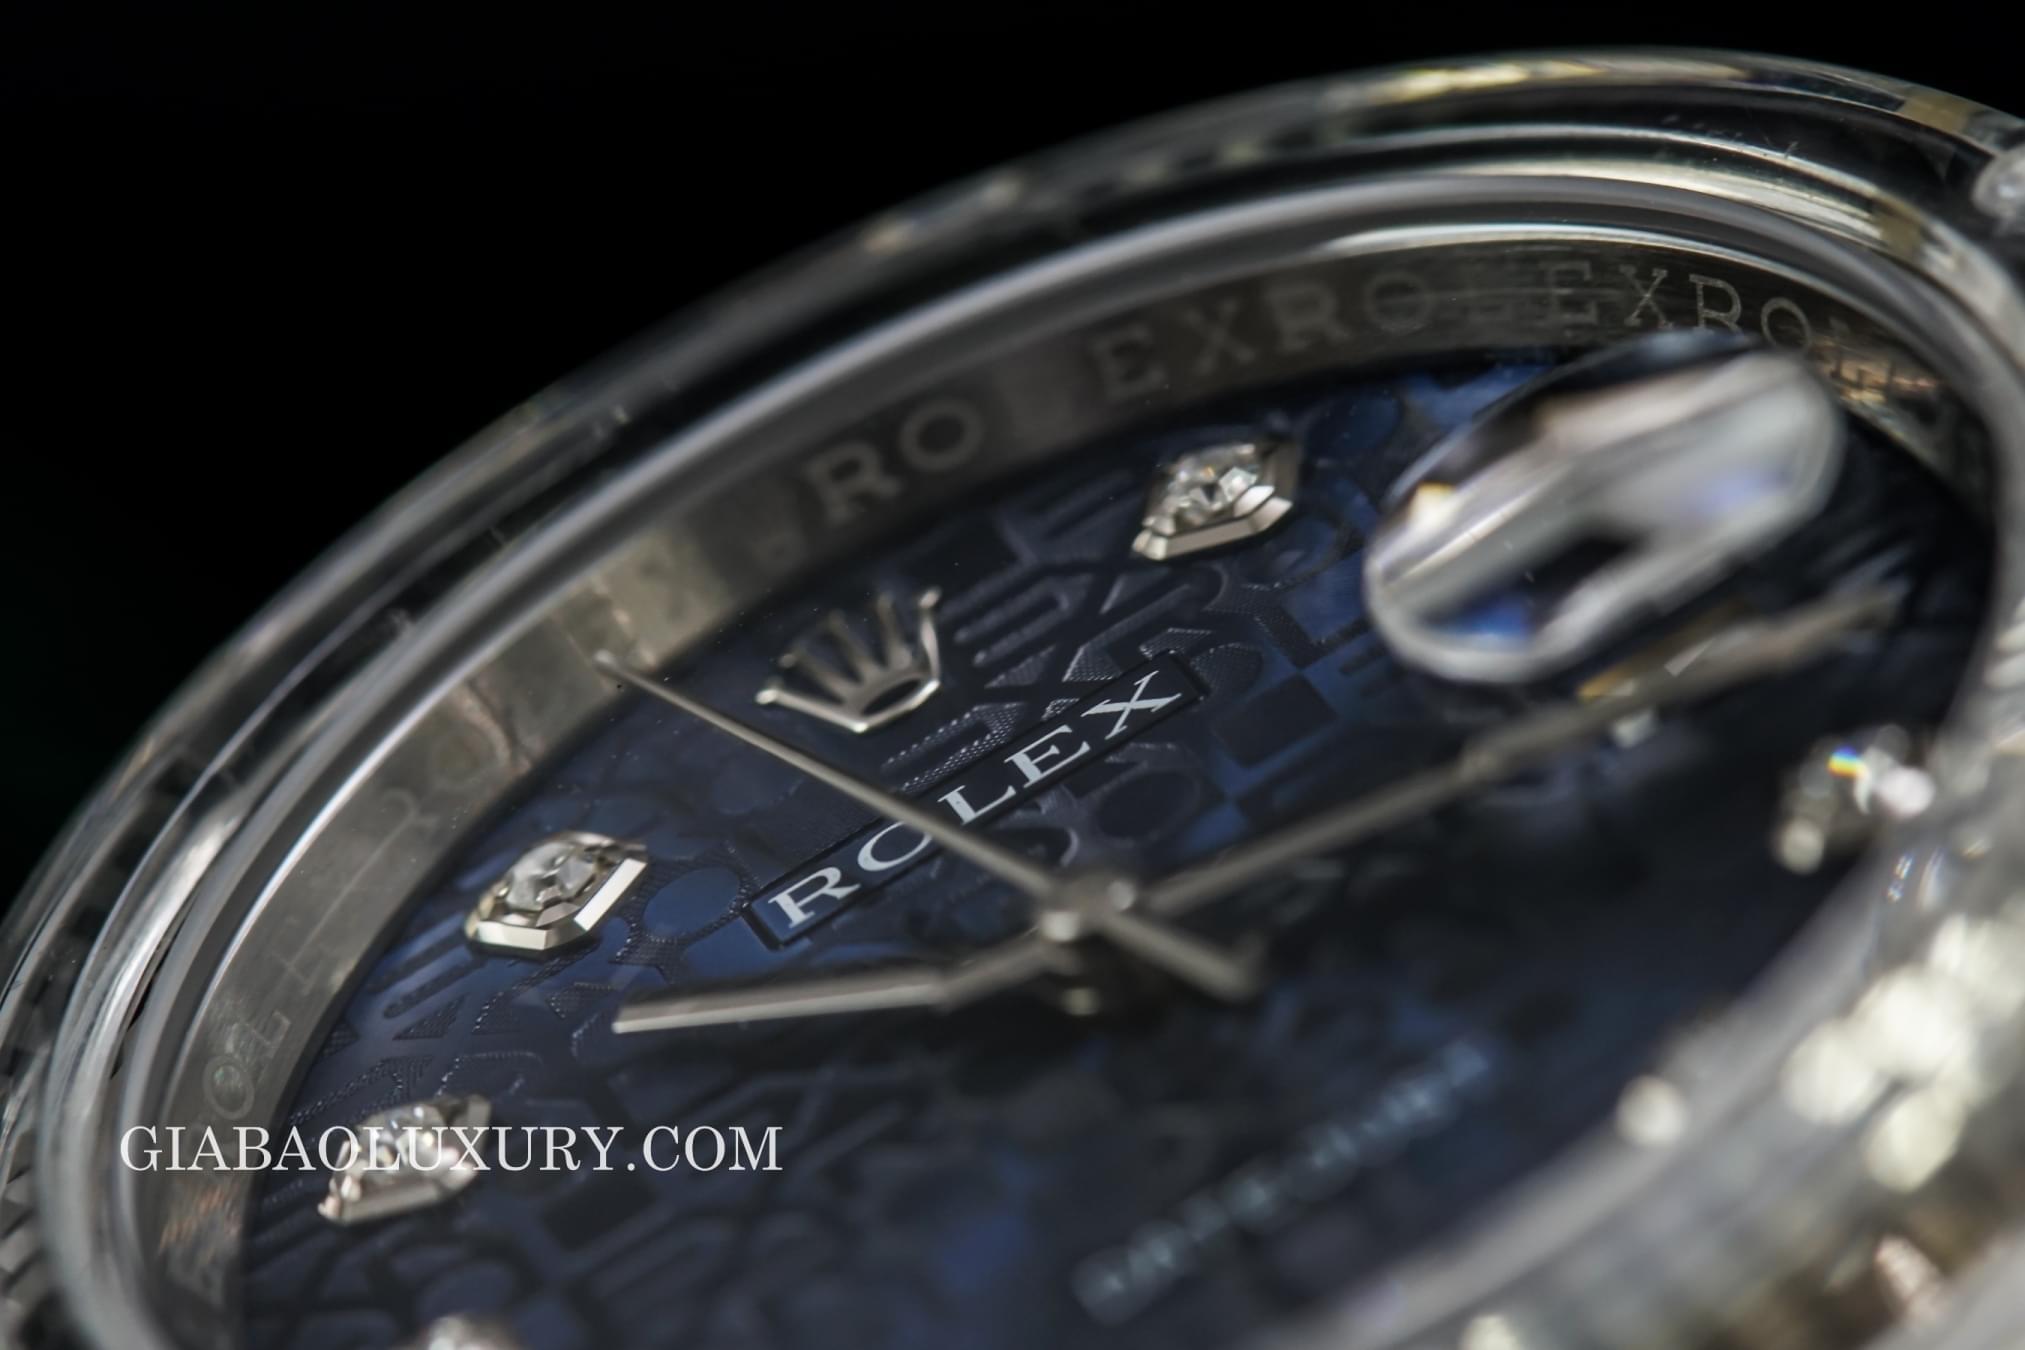 đồng hồ rolex datejust 116234